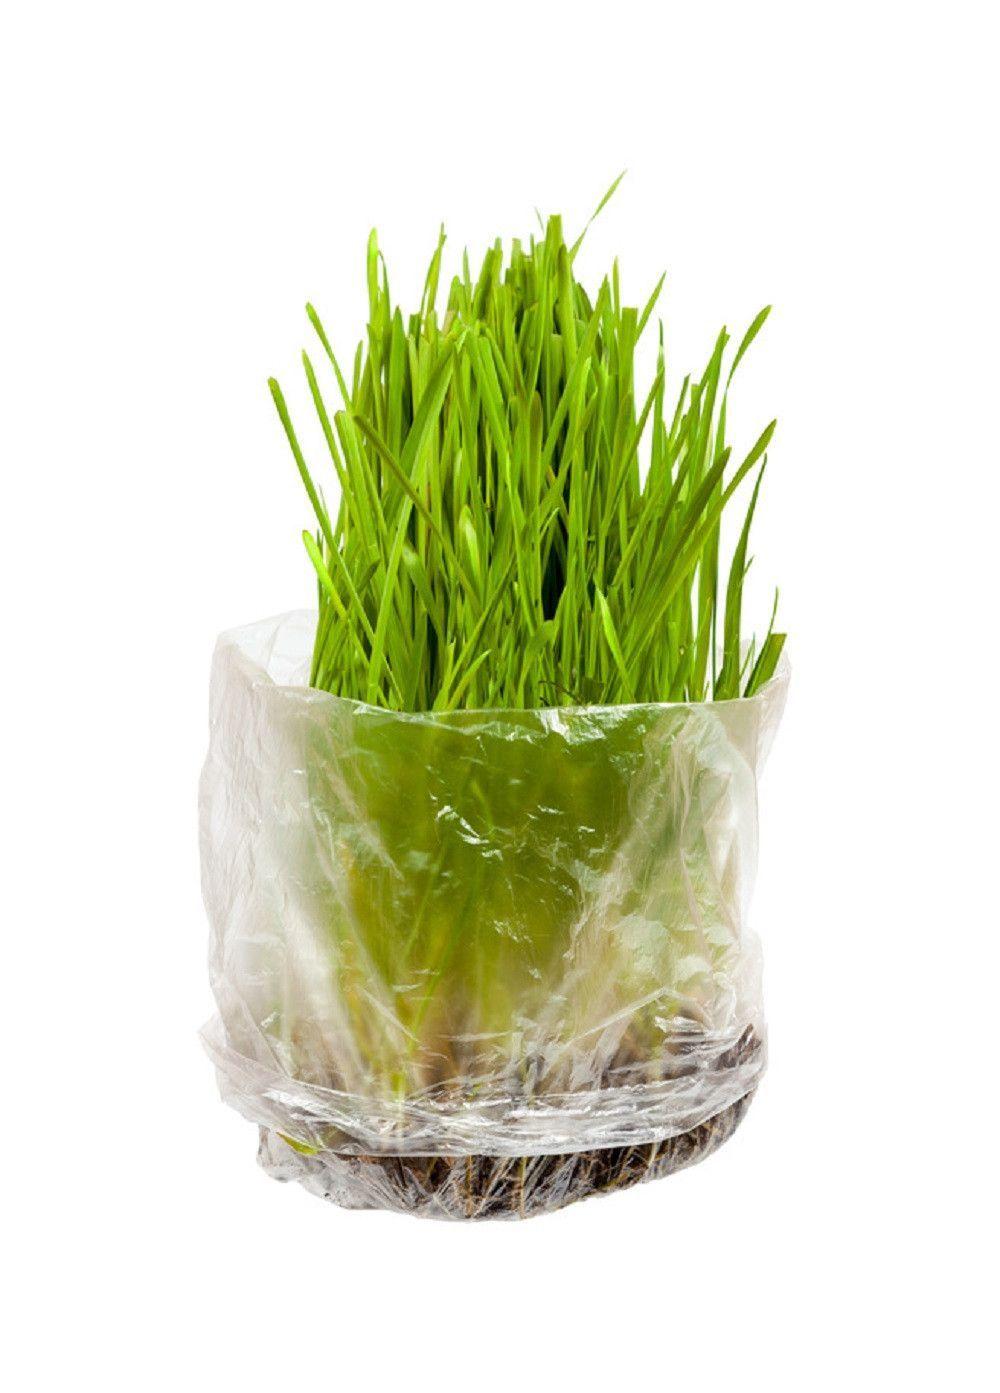 Premium Wheatgrass/ Cat Grass Seeds. High Germination, Non